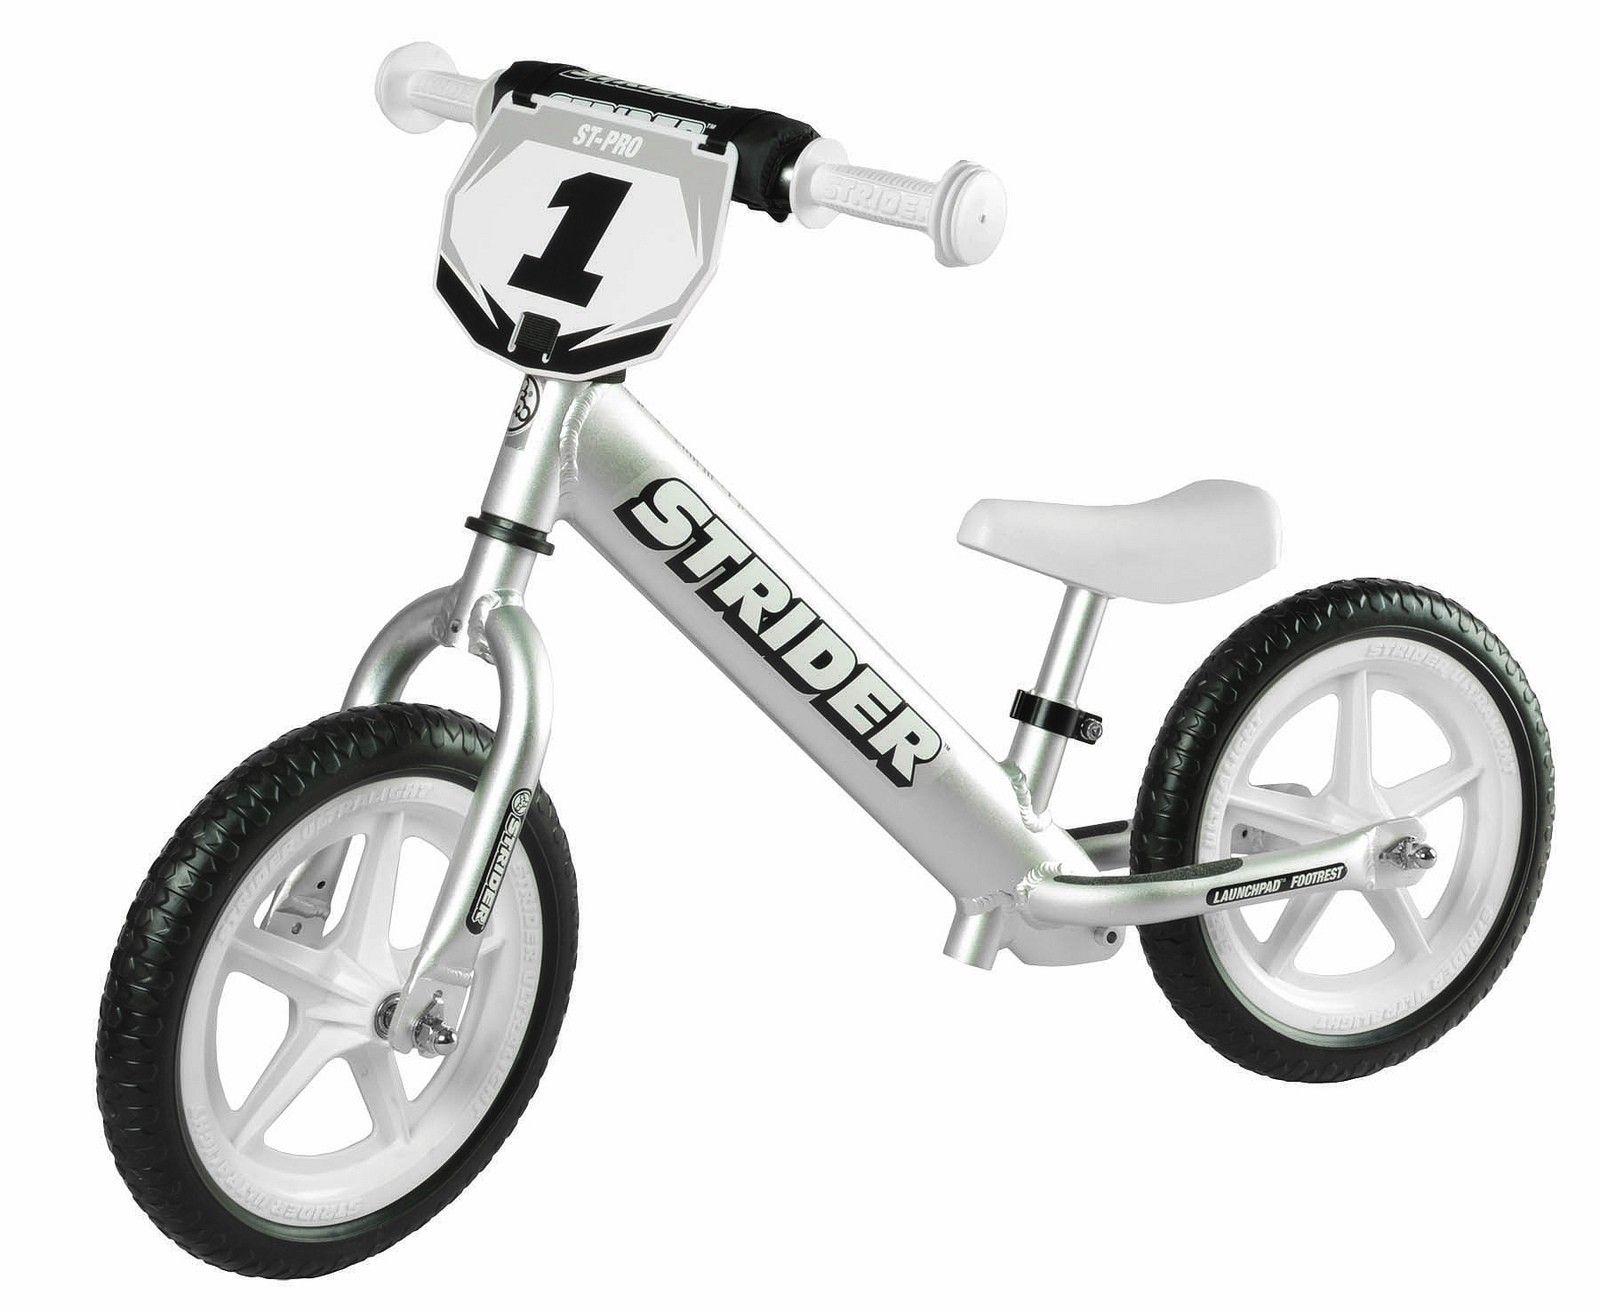 STRIDER® 12 Pro Balance Bike, AllAluminum, HighEnd Model